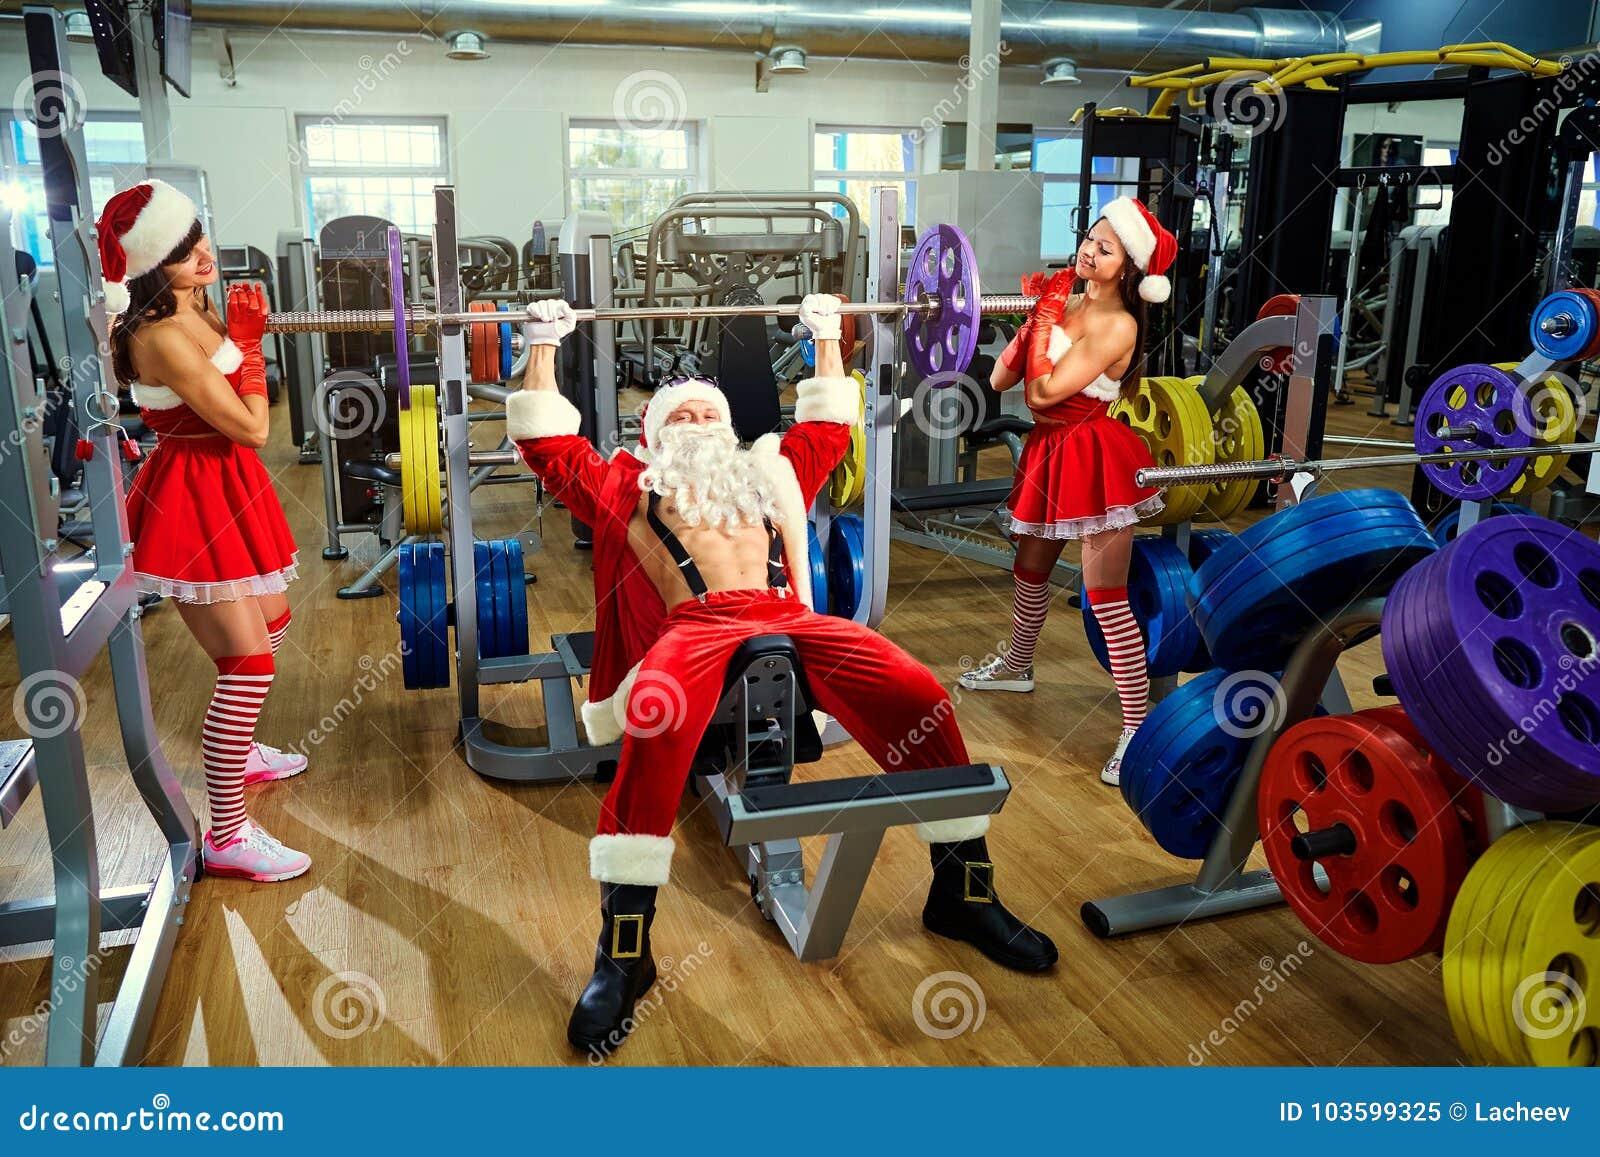 Спорт Санта Клаус с девушками в костюмах ` s Санты в спортзале дальше